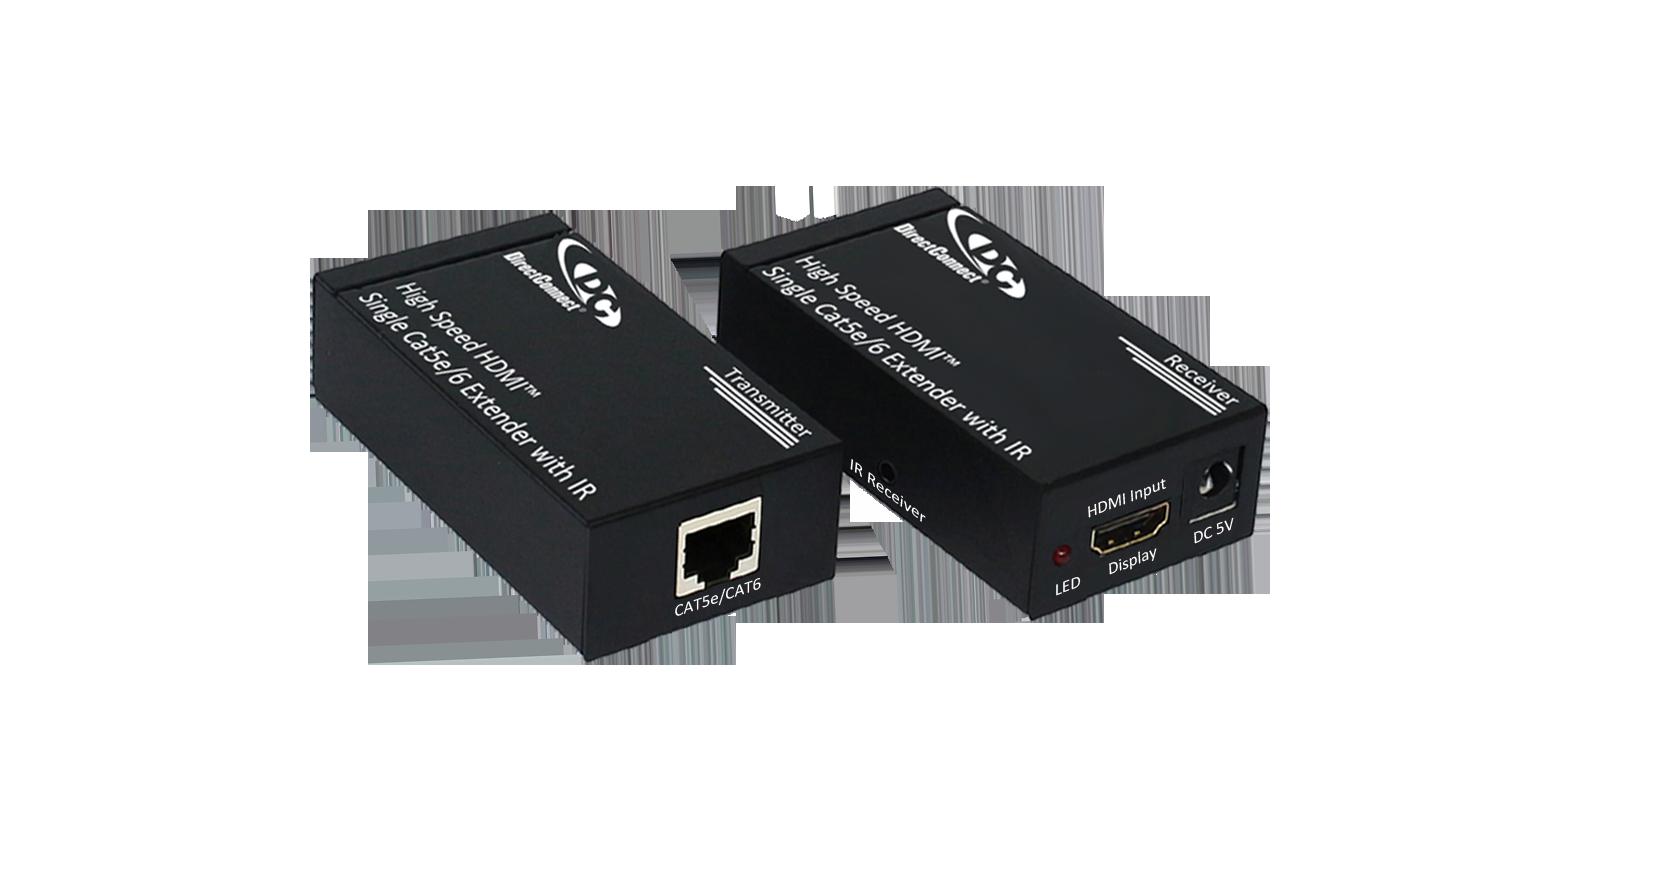 DCC5HIR-1 * DIRECTCONNECT HIGH SPEED HDMI 1080P TRANSMIT/RECEIVE VIDEO & DIGITAL AUDIO BALUN SINGLE CAT5E 1080P UP TO 40M OR 1080I 60M OR CAT6 50M AT 1080P NEW GENERATION EDID WITH DUAL 2W IR